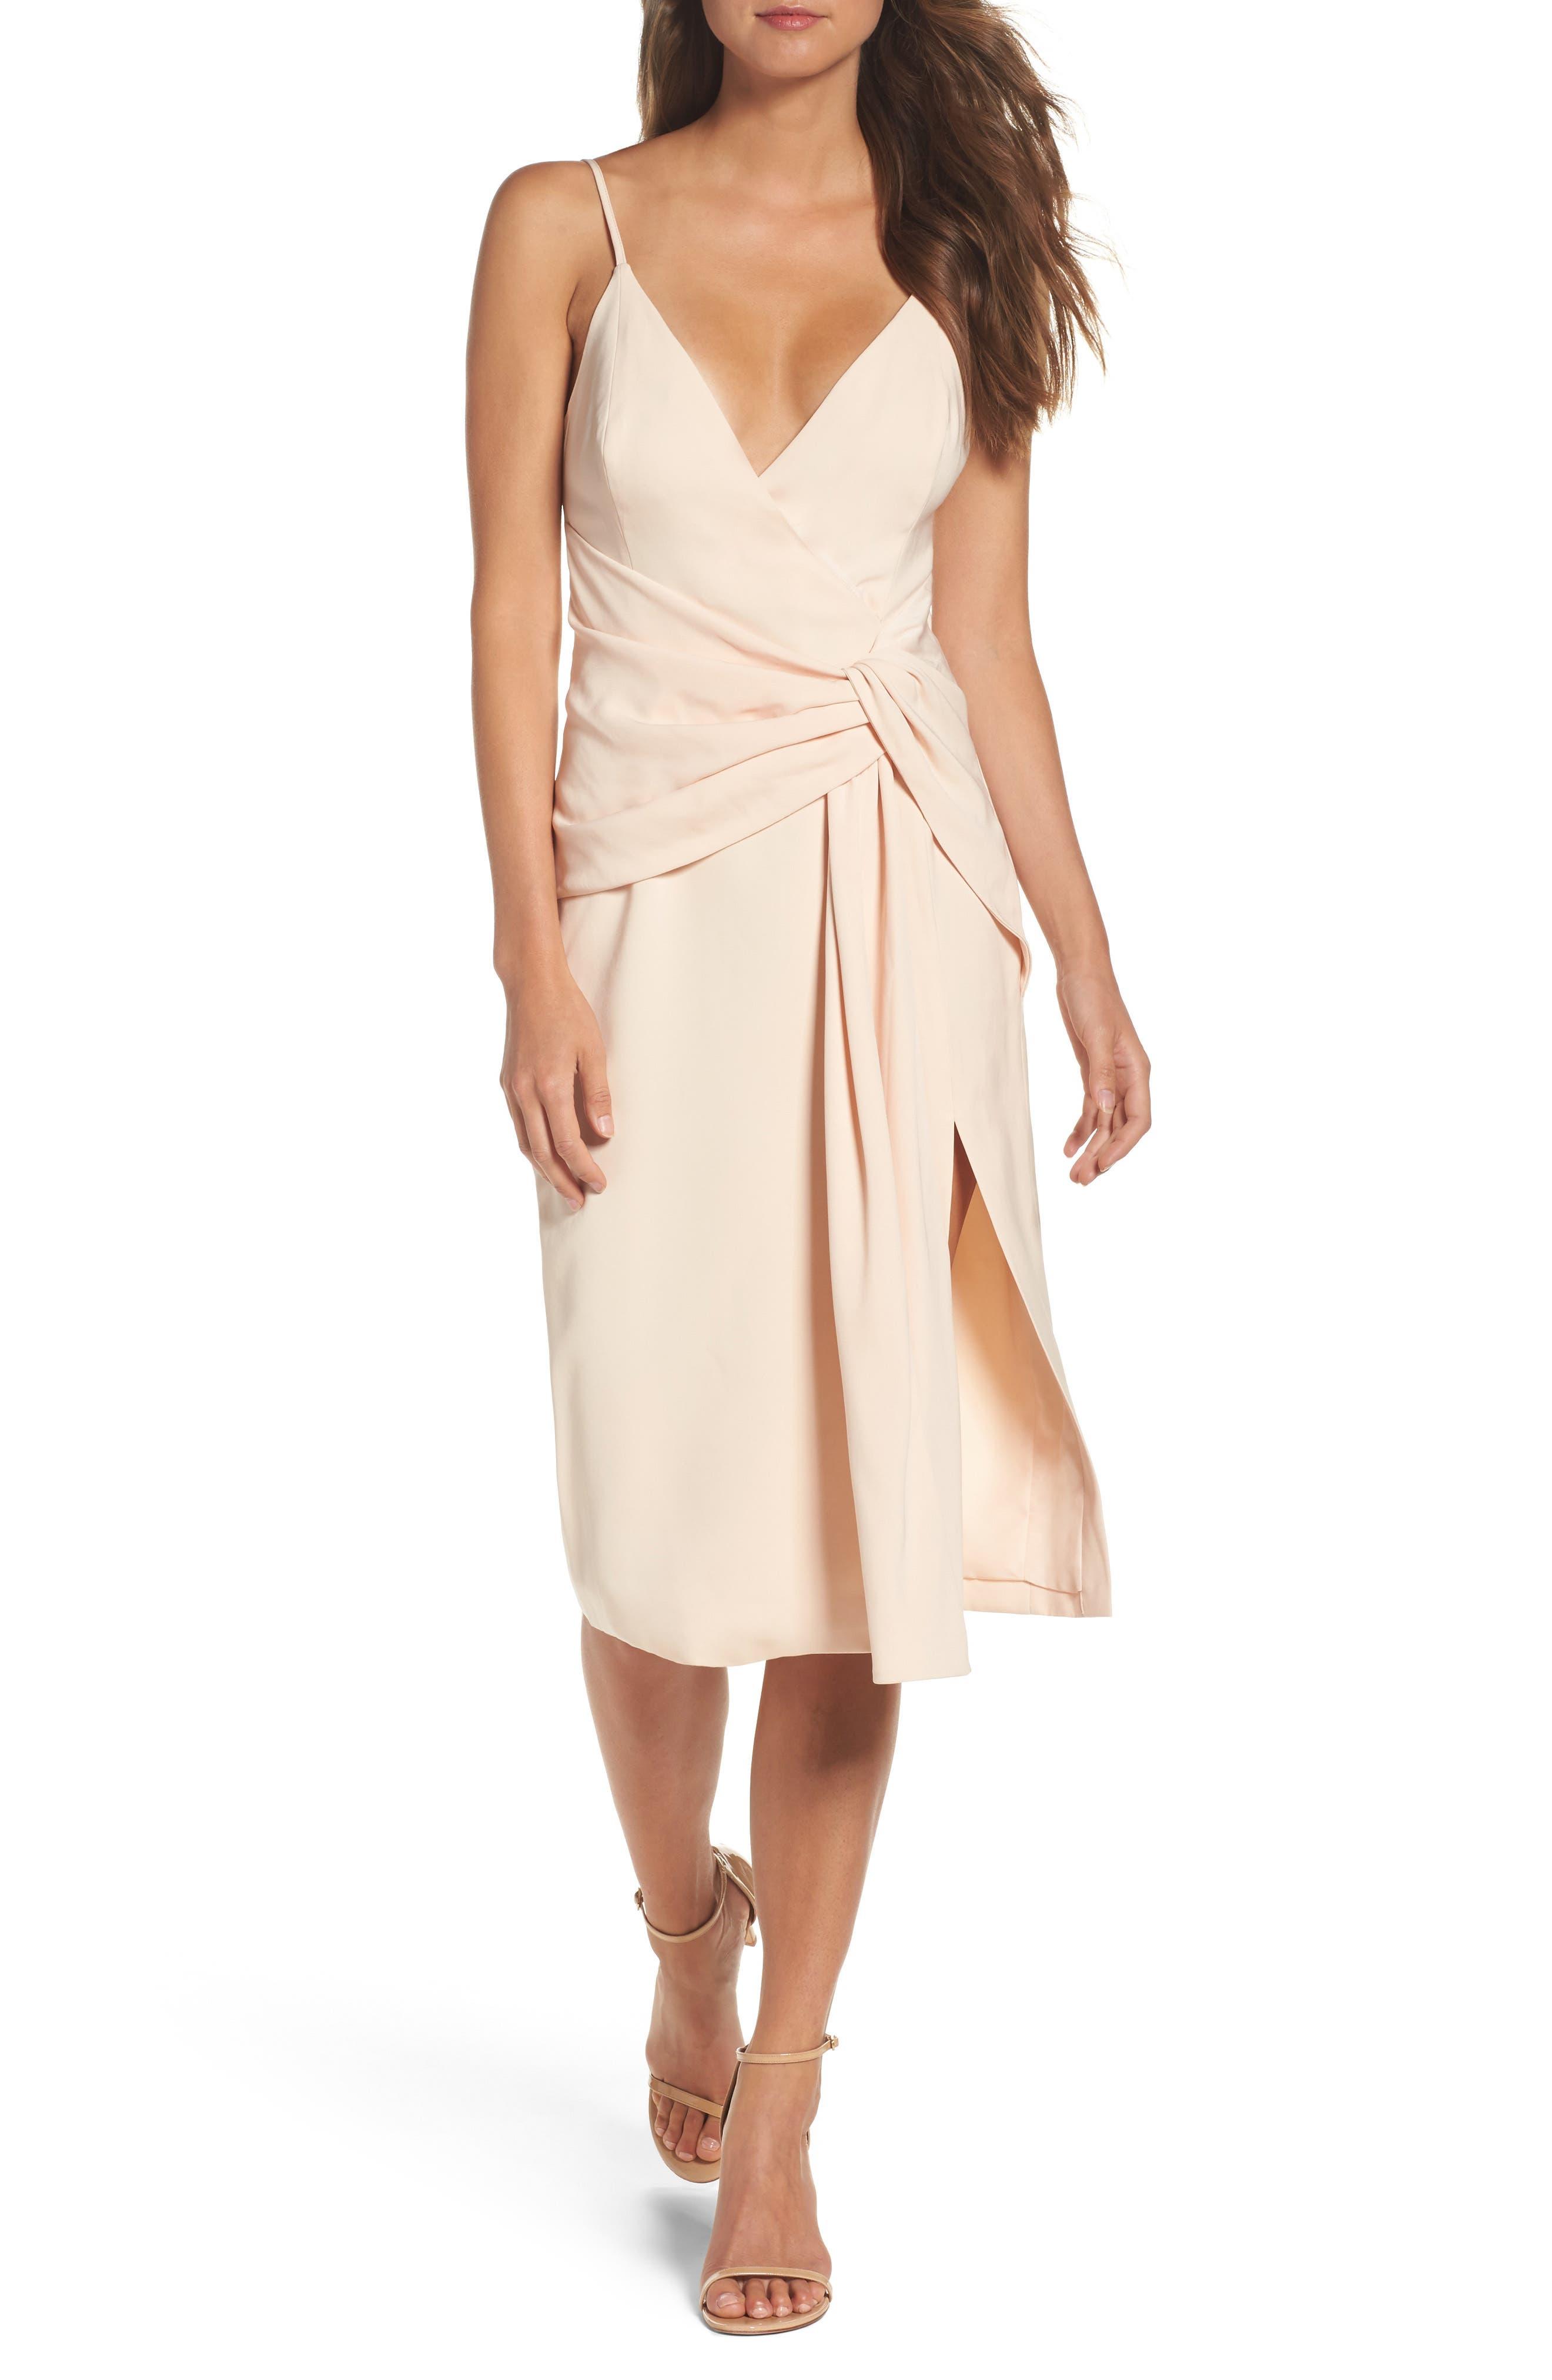 C/MEO Collective Enlighten Sheath Dress